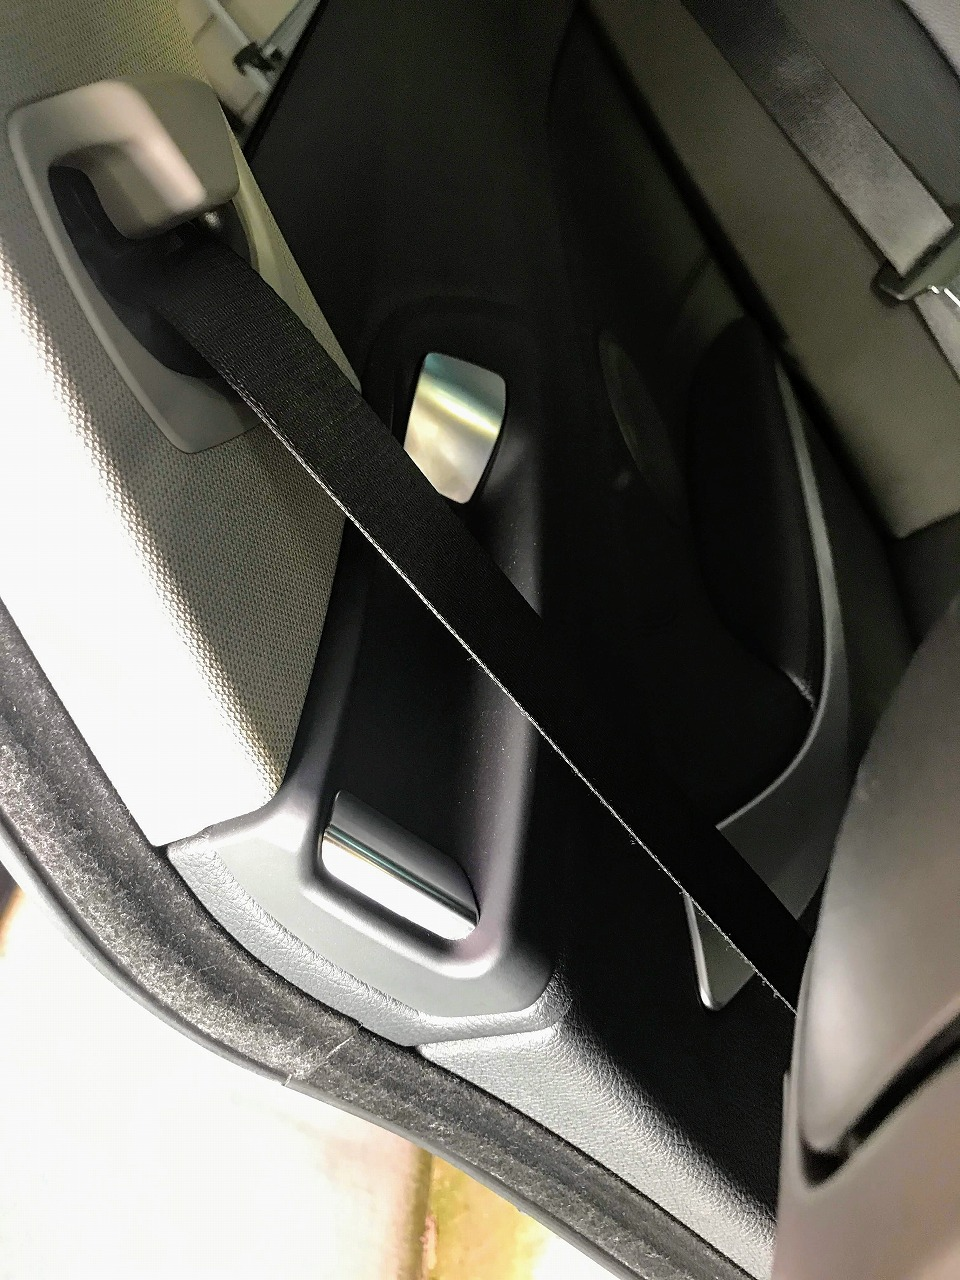 BMW新型X5の3列シート乗り込み時のギミックが凄い!シートベルトを引っ張ると自動で後席シートが倒れます^^動画あり